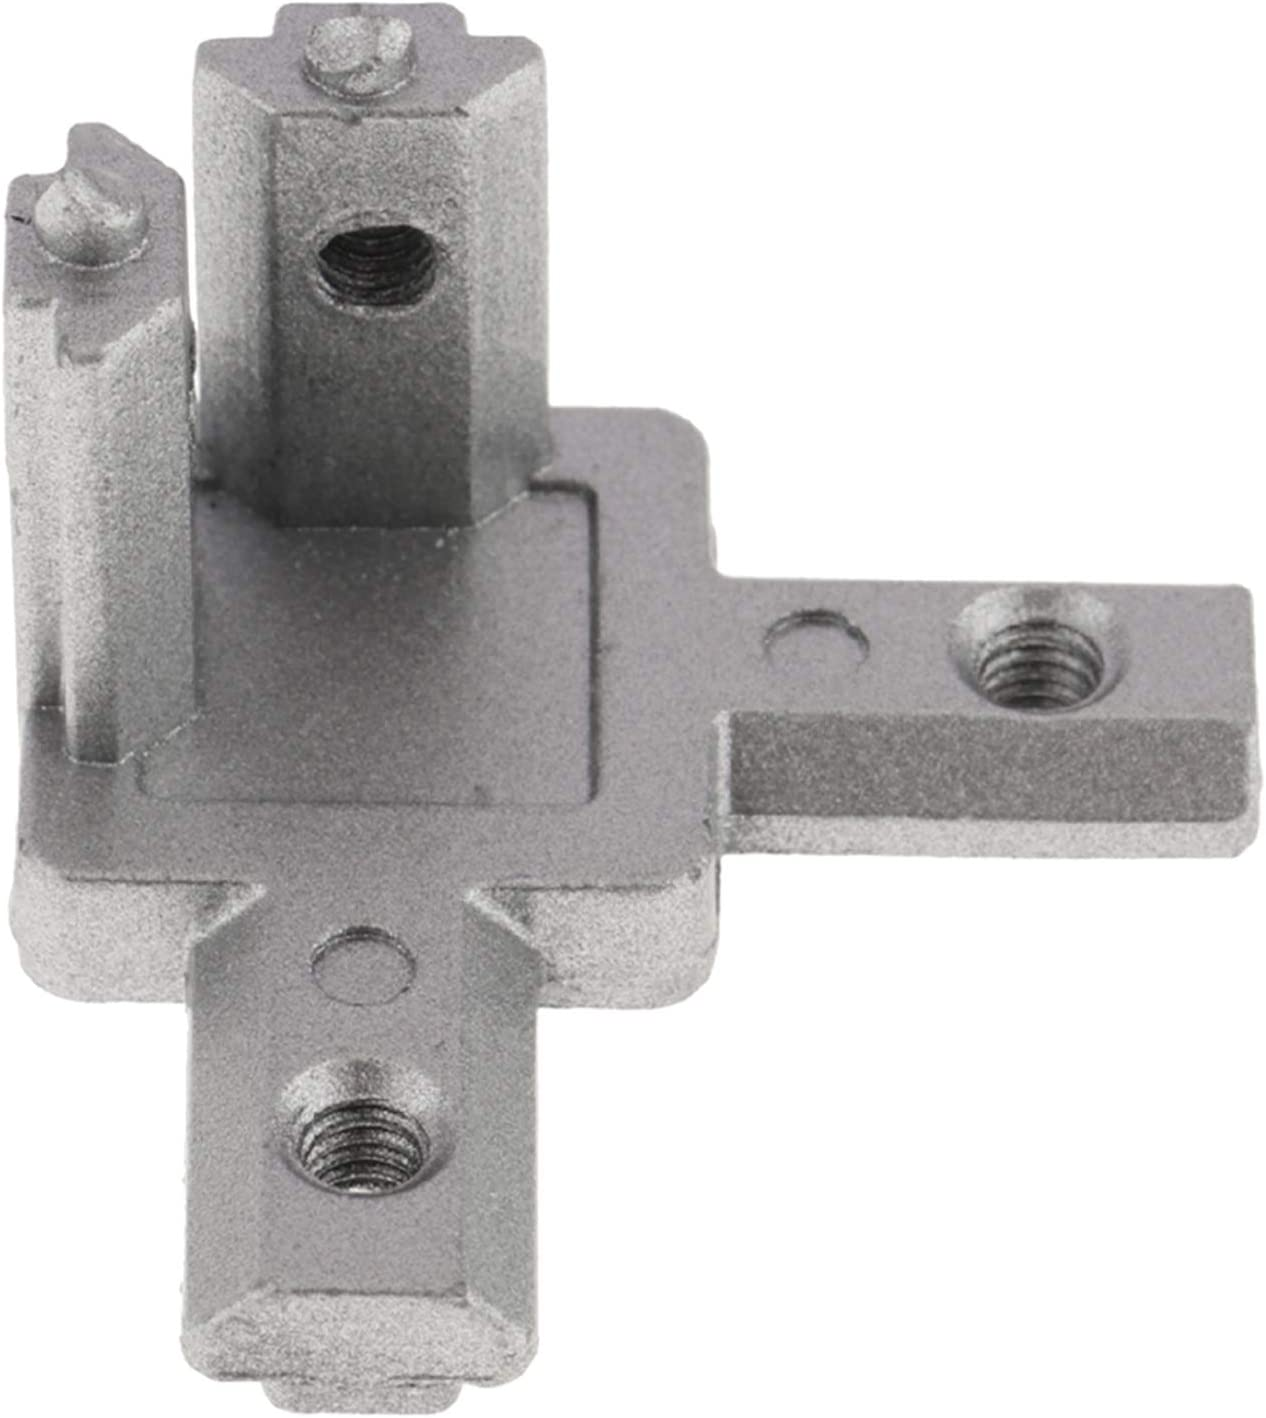 Milageto L 3 Pole 90 Degree Inner Corner Connector for Aluminum T Slot Profile 2020 EU